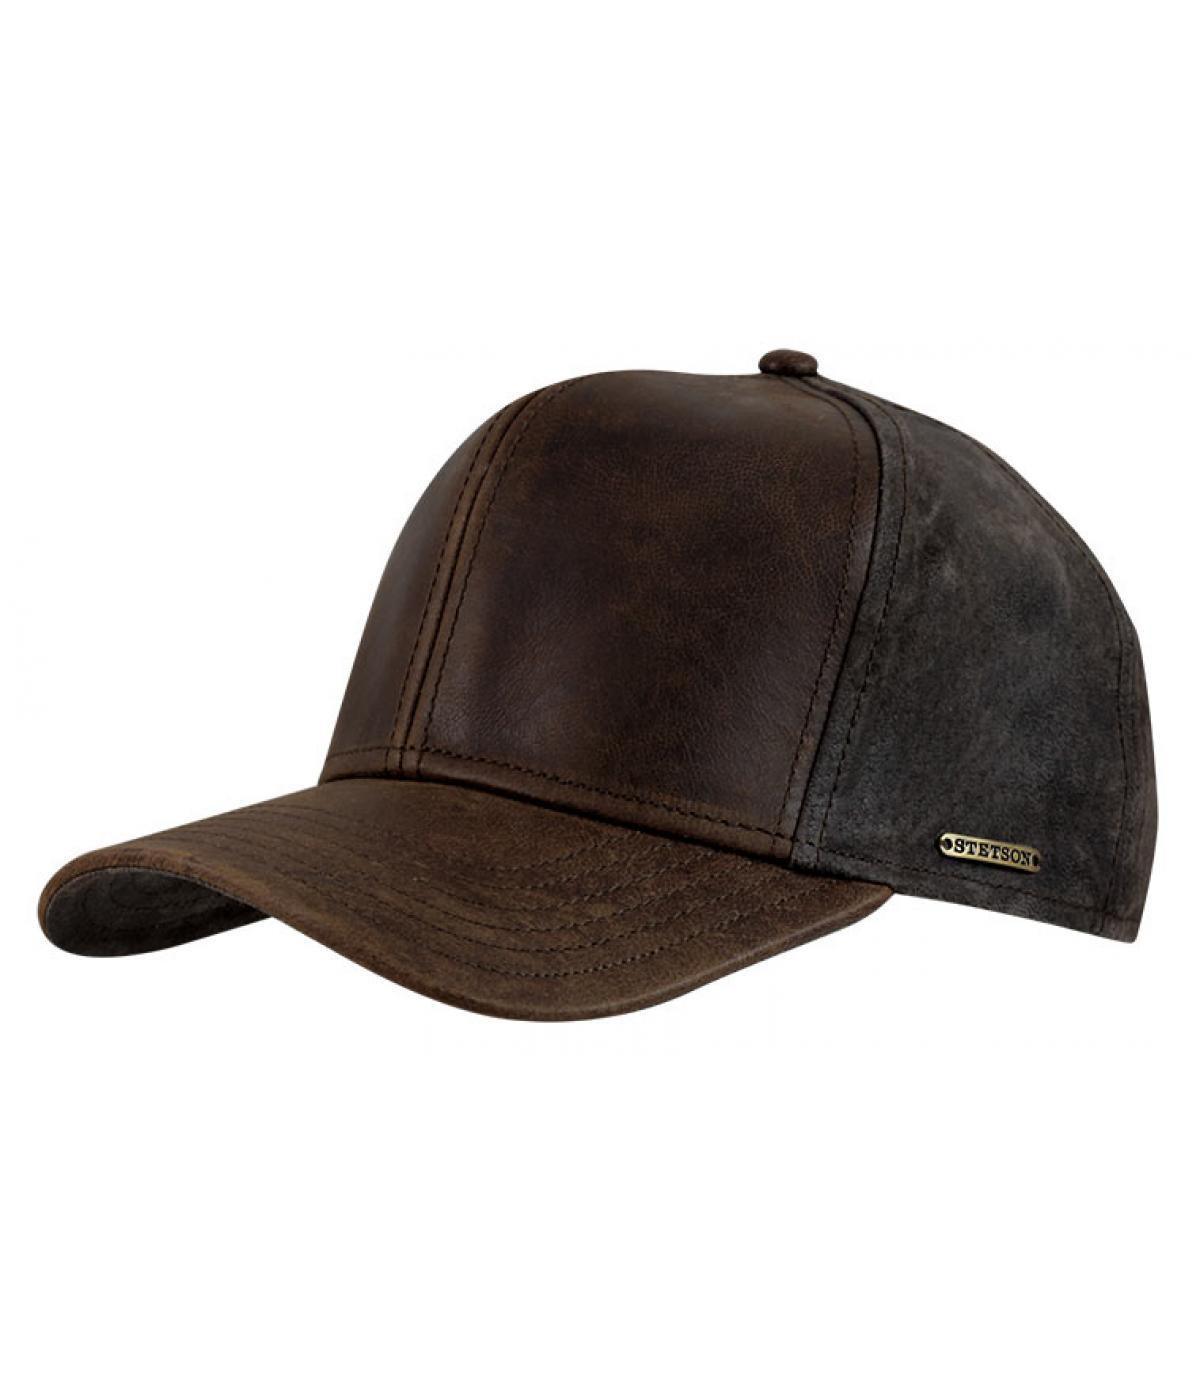 Cappellino campbell pelle